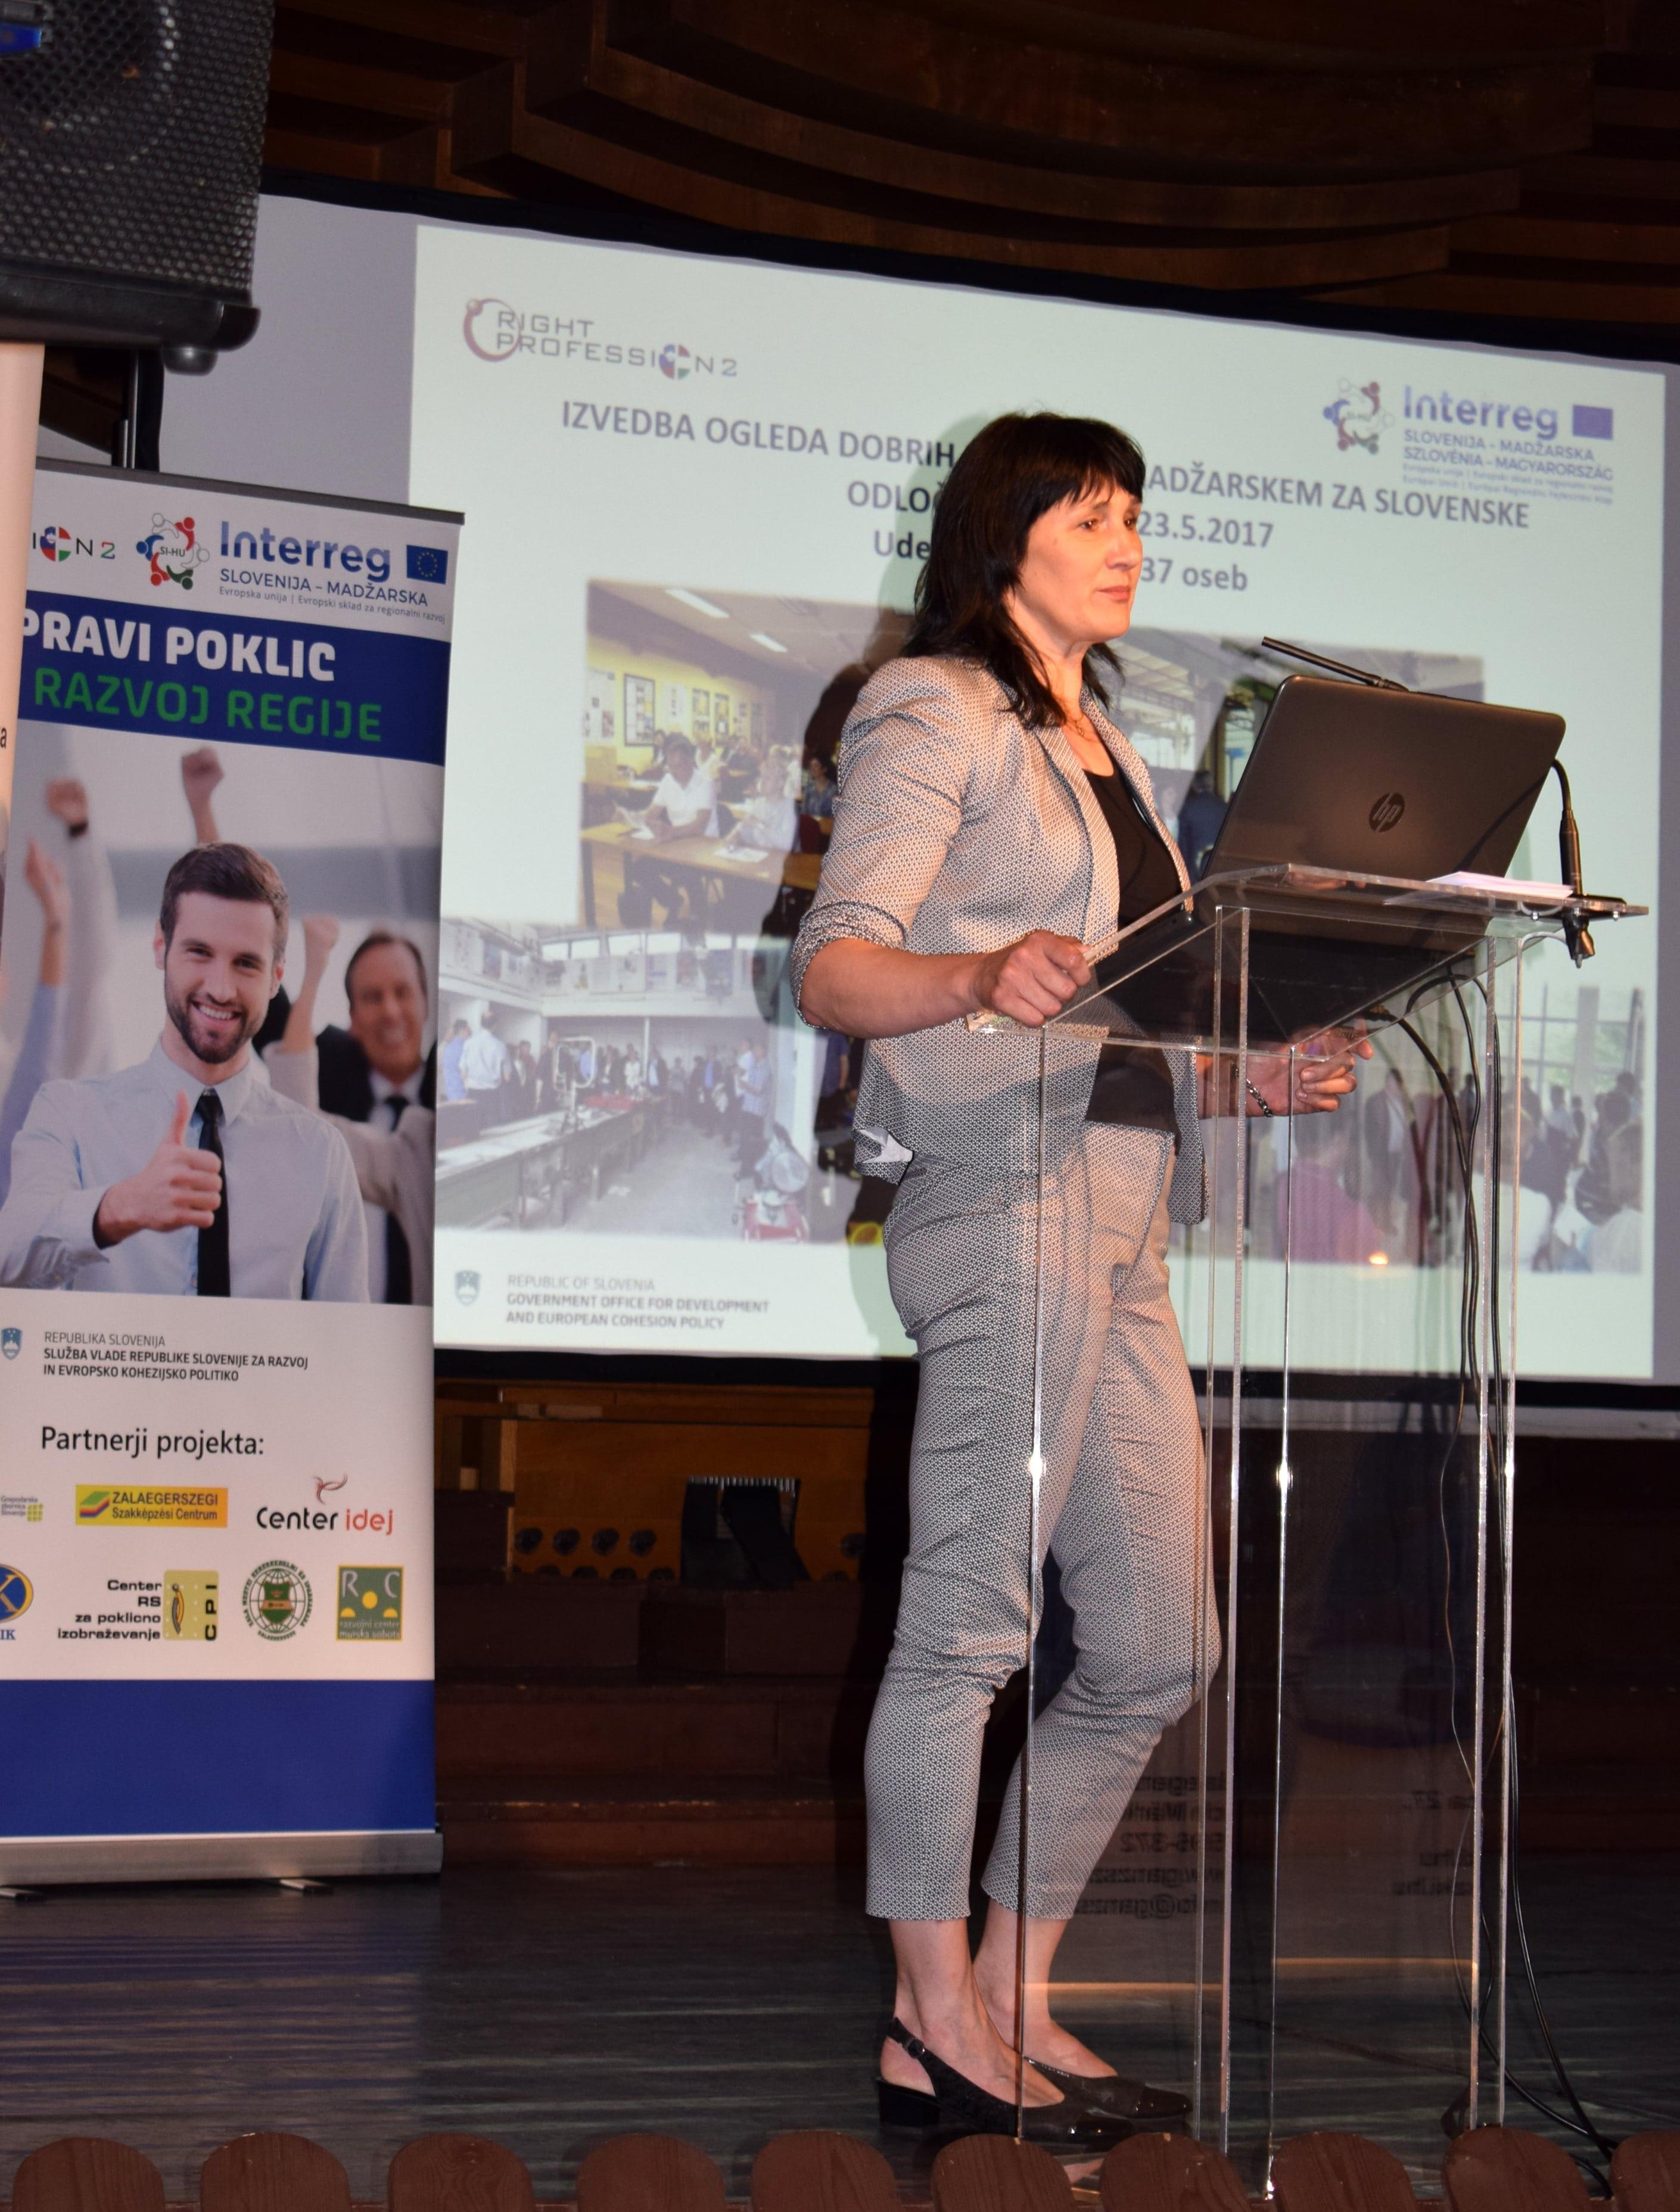 RP2_Closing_Conference_Zalaegerszeg_010_2019_06_05-min